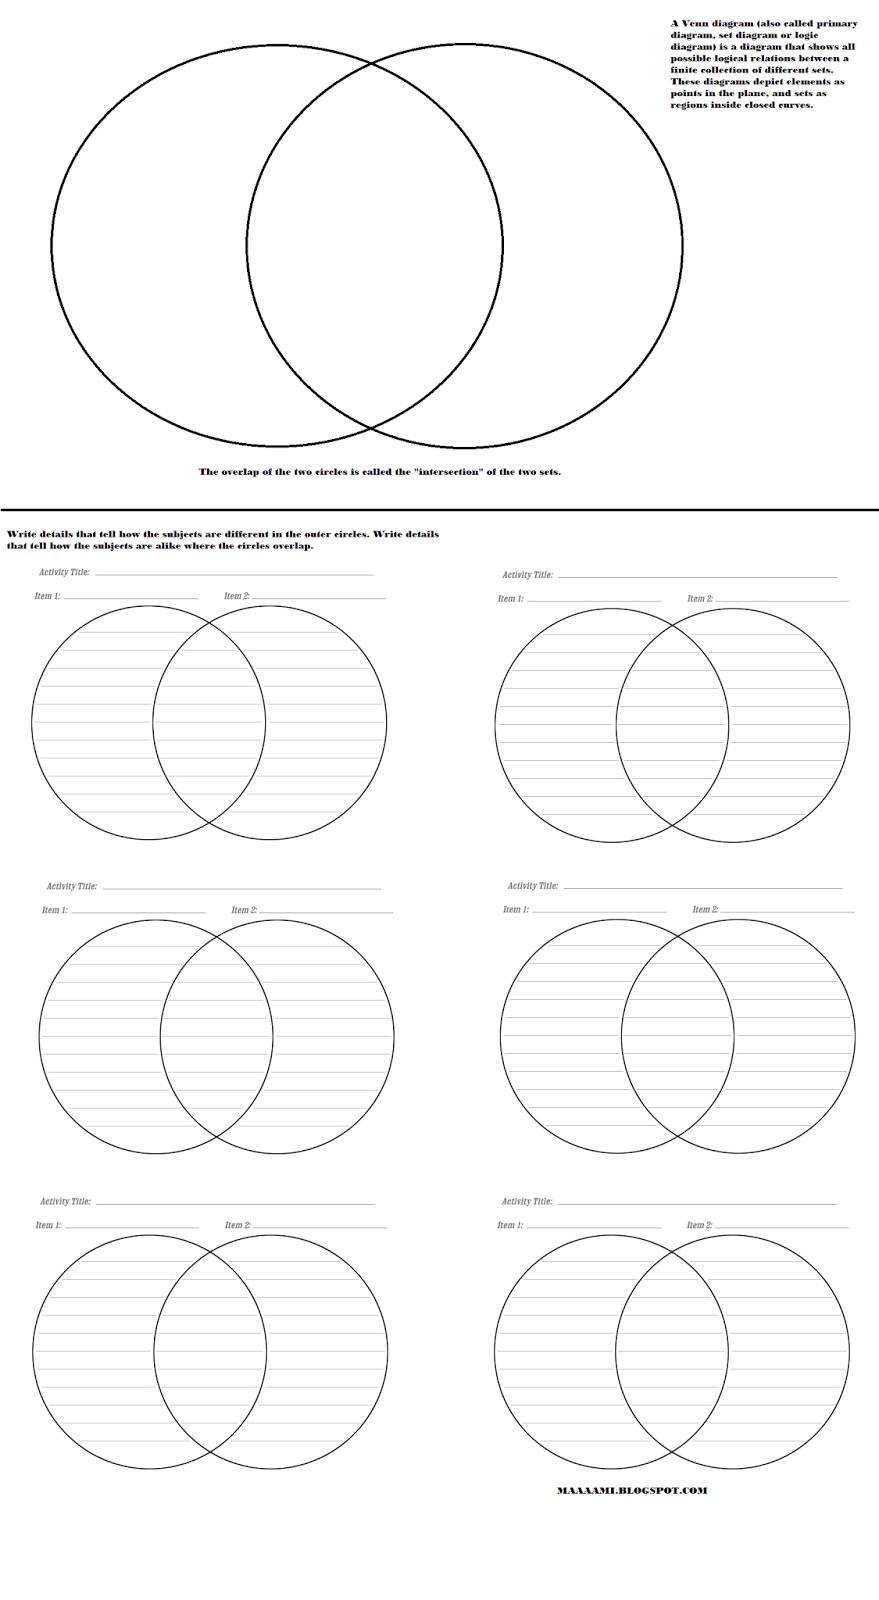 Ader Family Home School: Venn diagram (also called primary